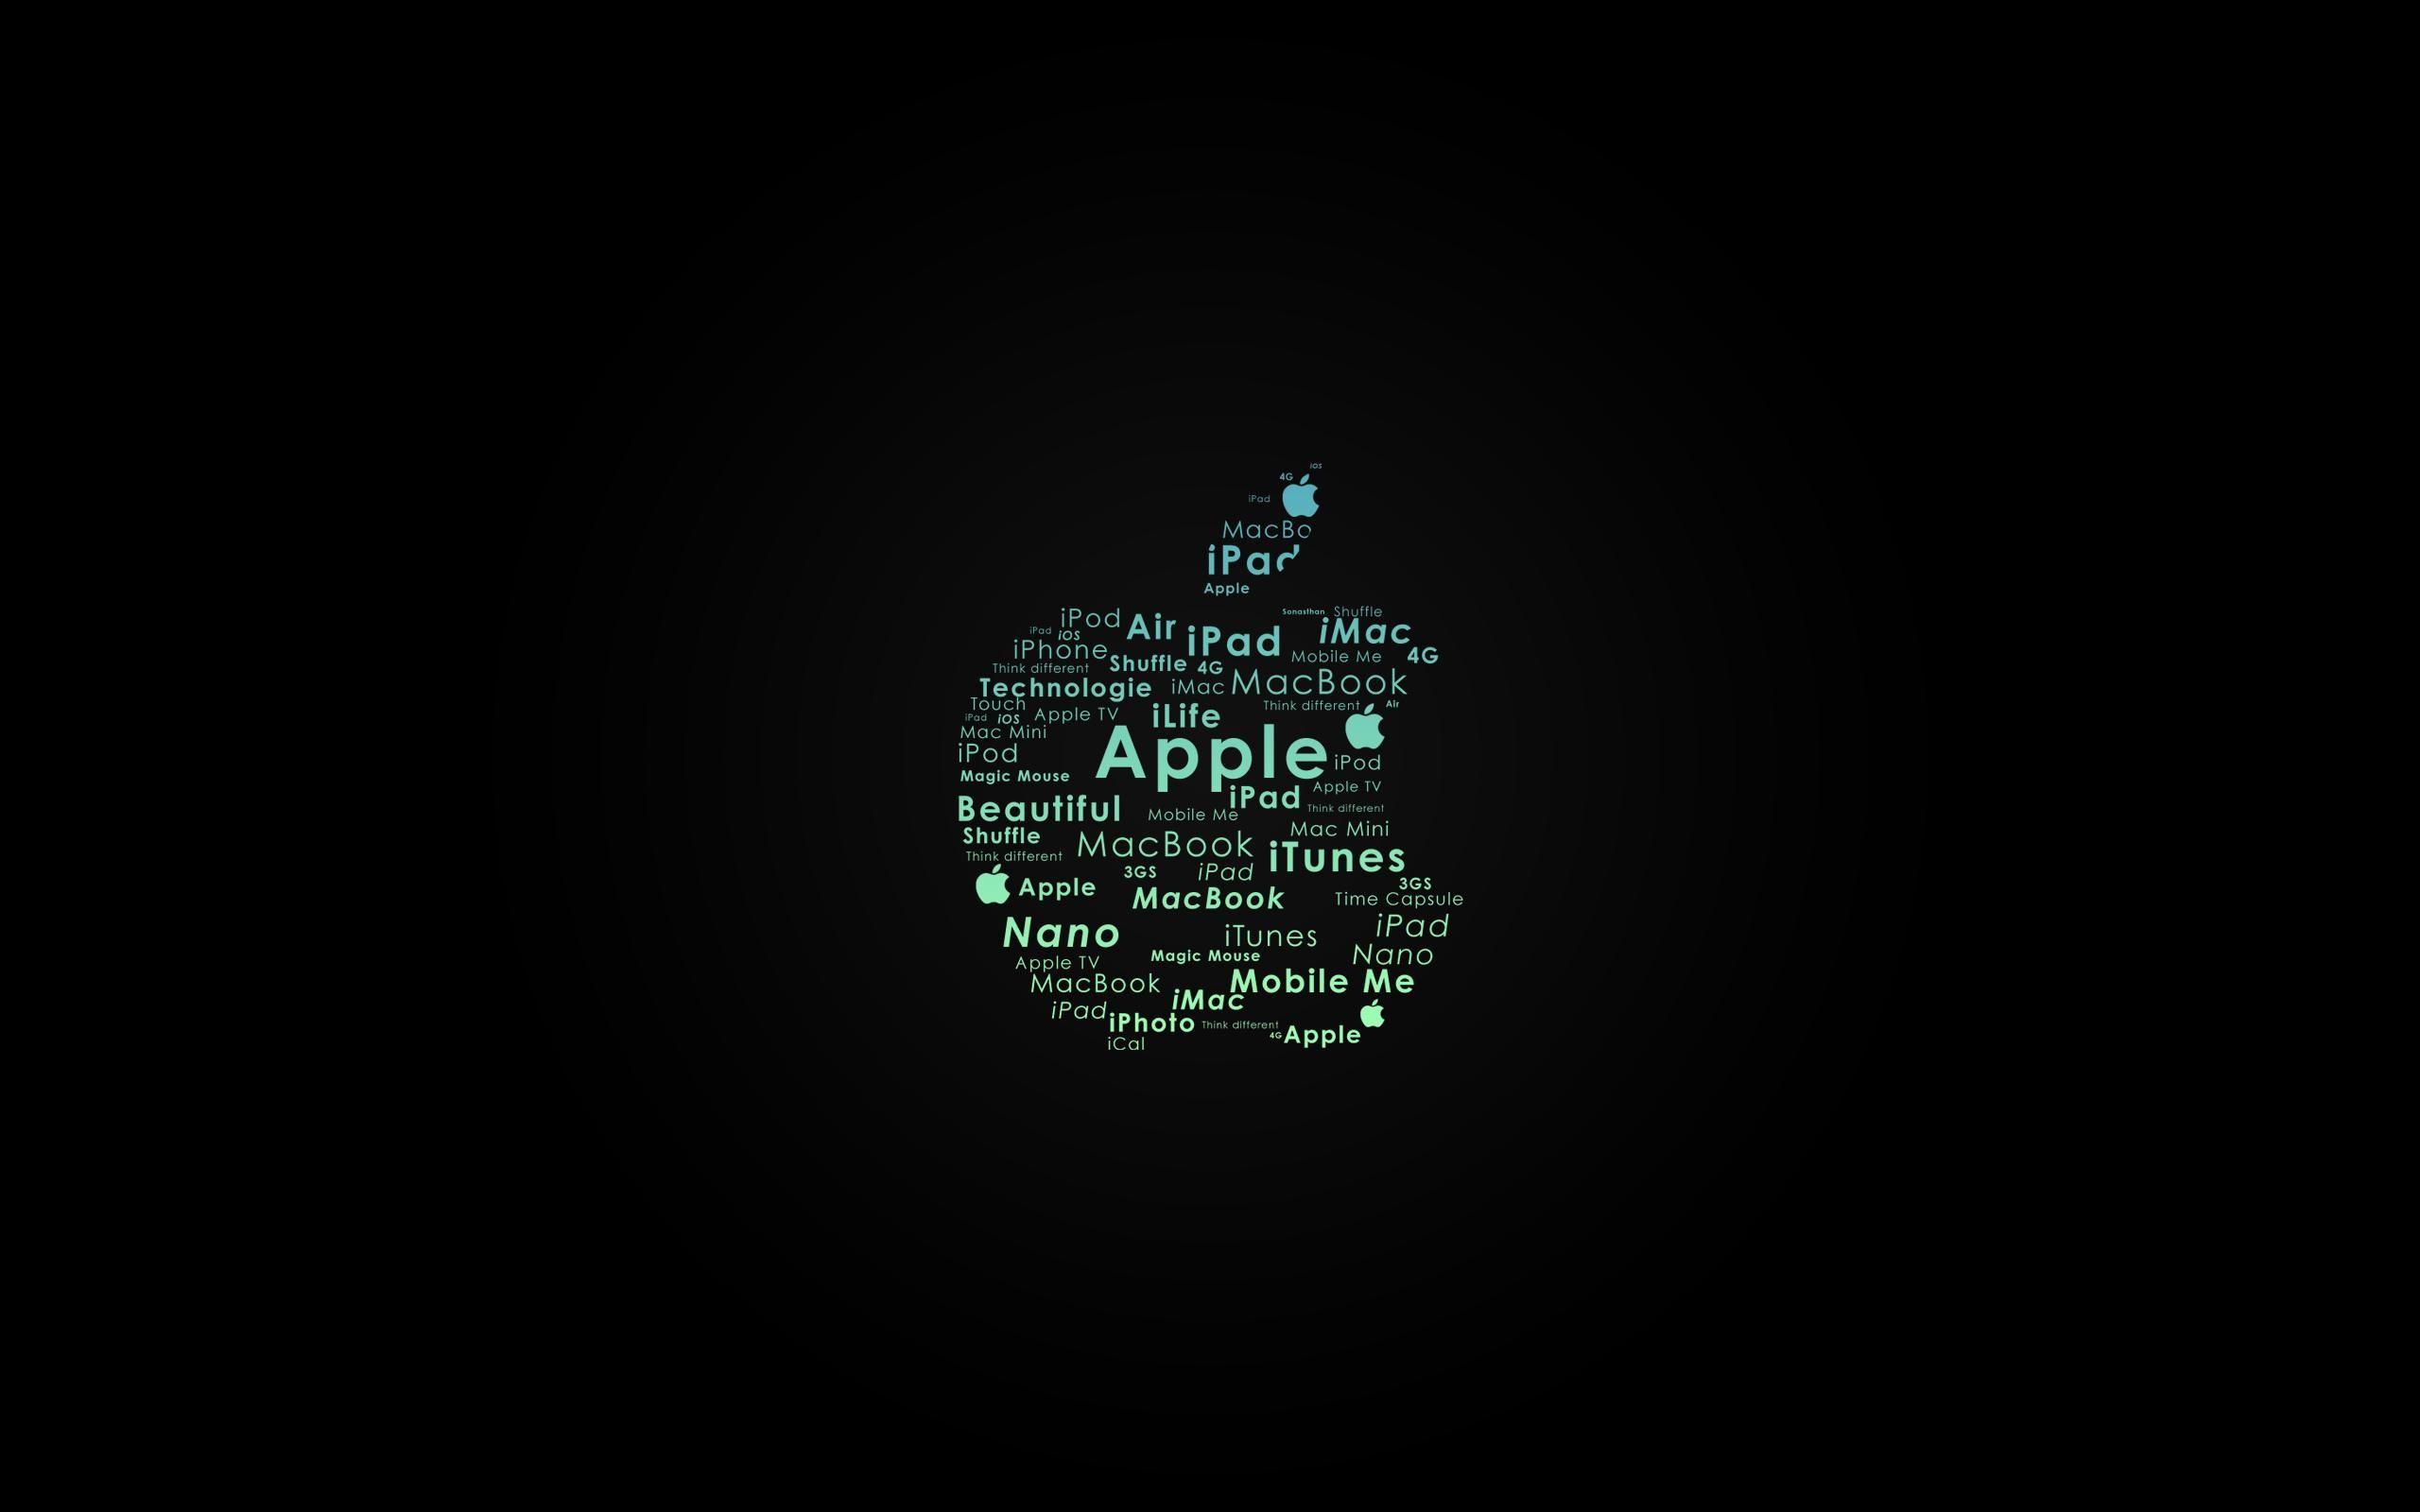 mac macintosh apple computers hd wallpapers desktop backgrounds rh pinterest com